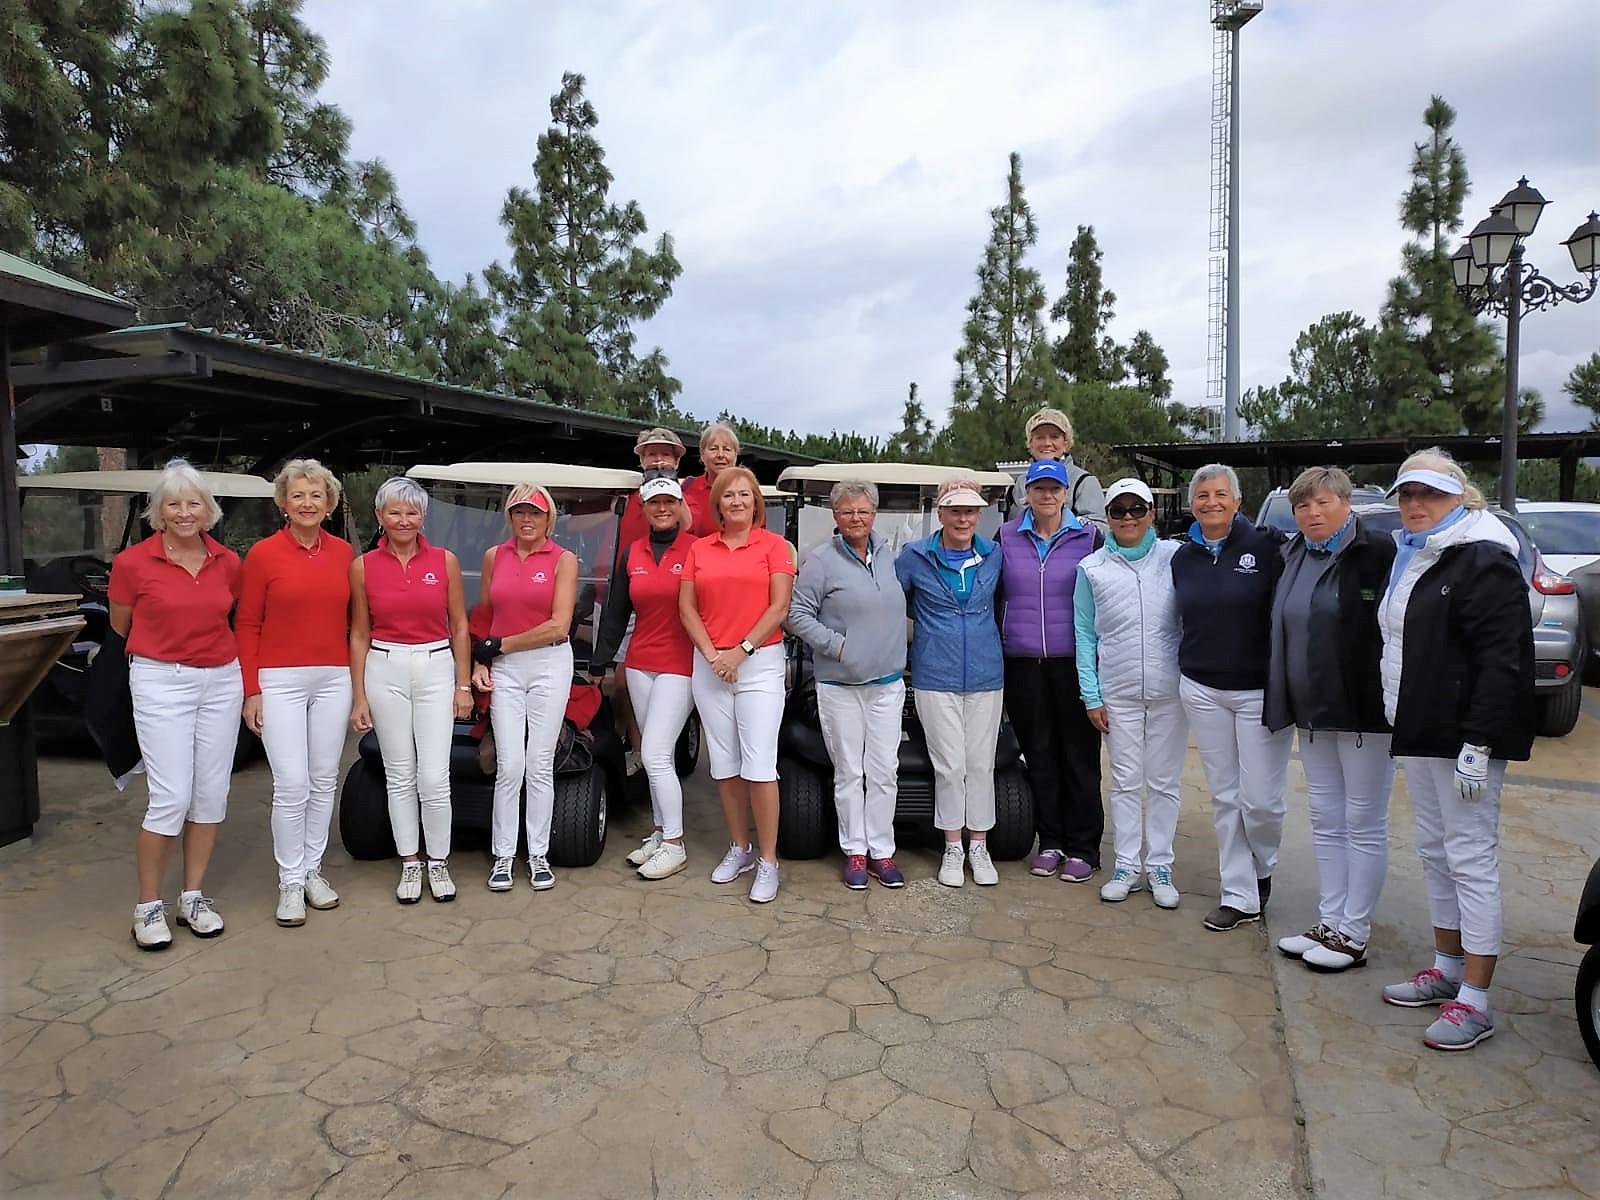 chaparral golf club ladies